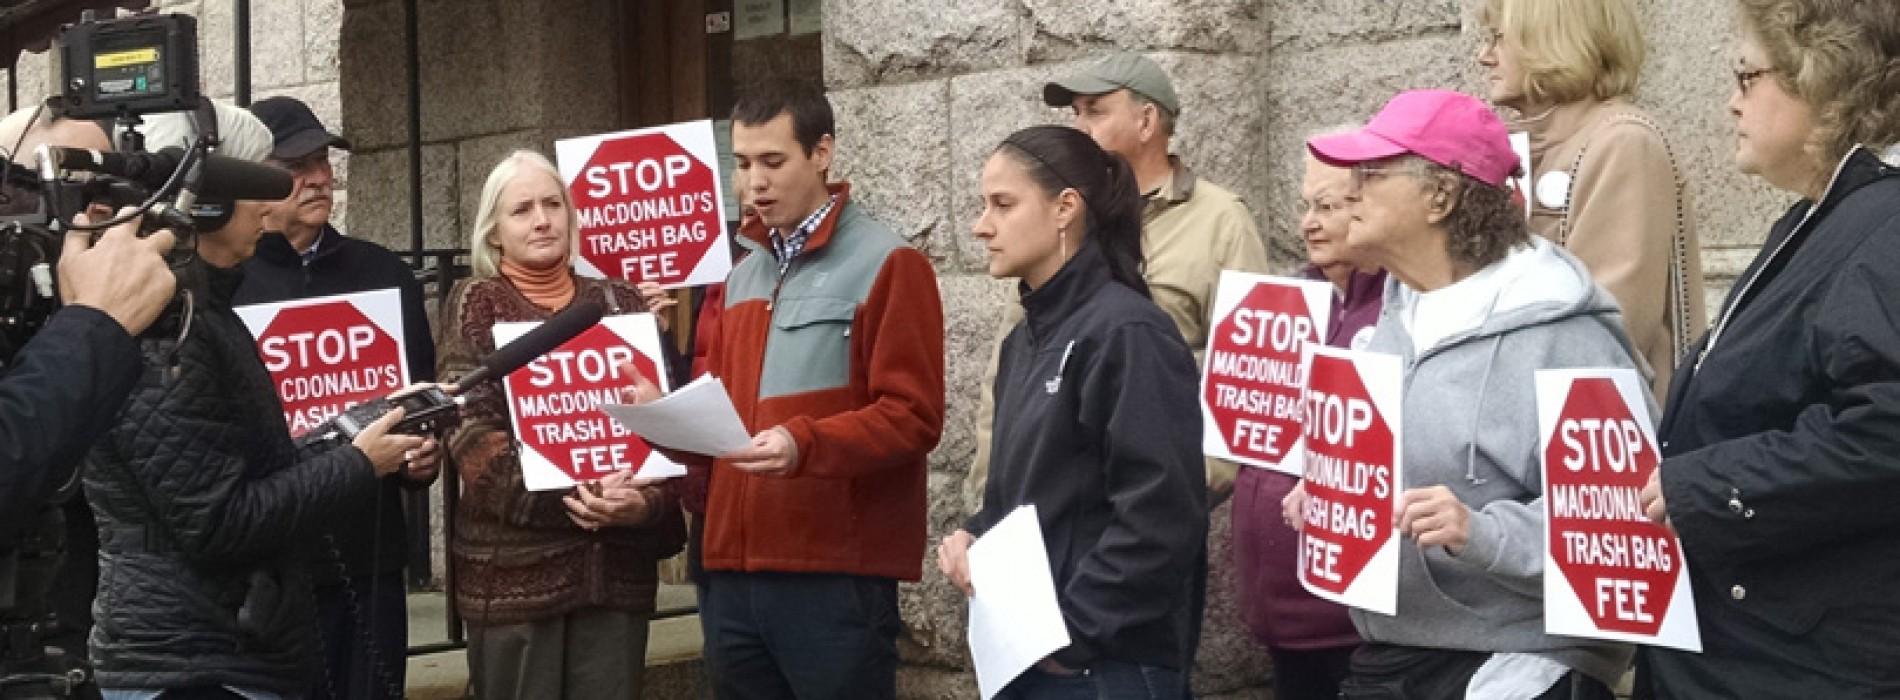 Ben Chin rallies opposition to Mayor Macdonald's new trash bag fee